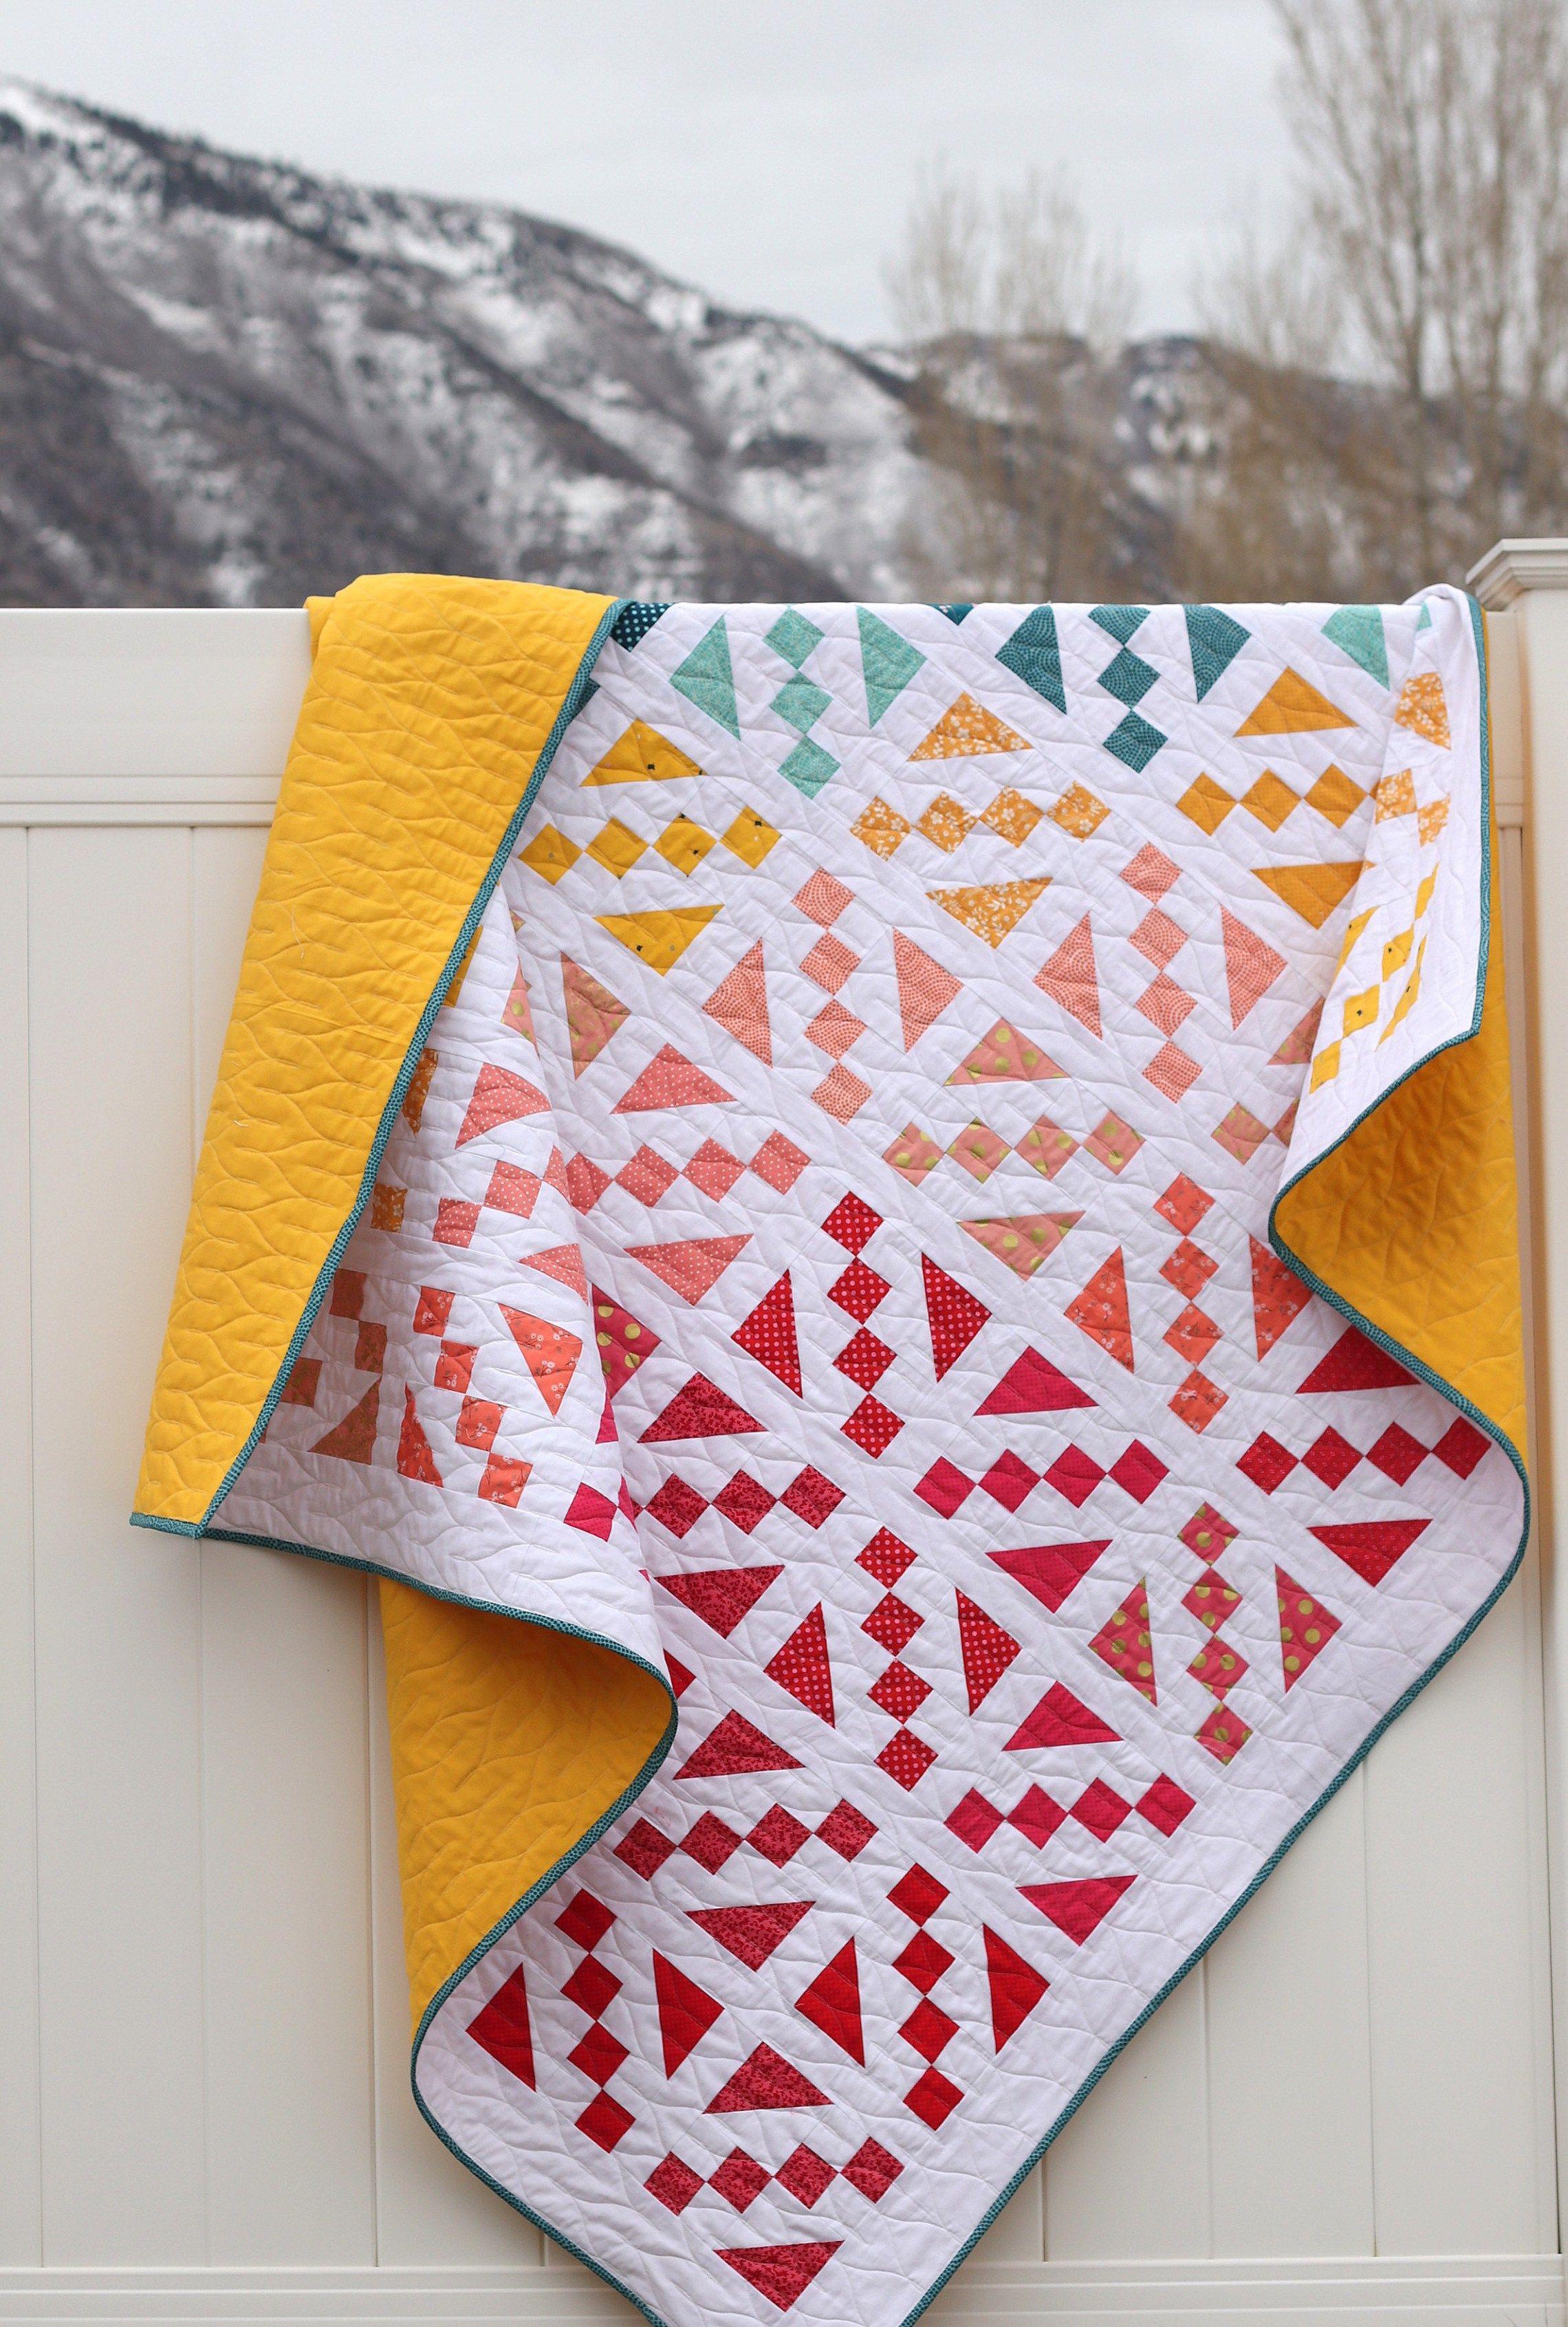 Cake Mix Precuts Quilt Patterns Precut Quilt Patterns Precut Quilts Modern Quilt Patterns